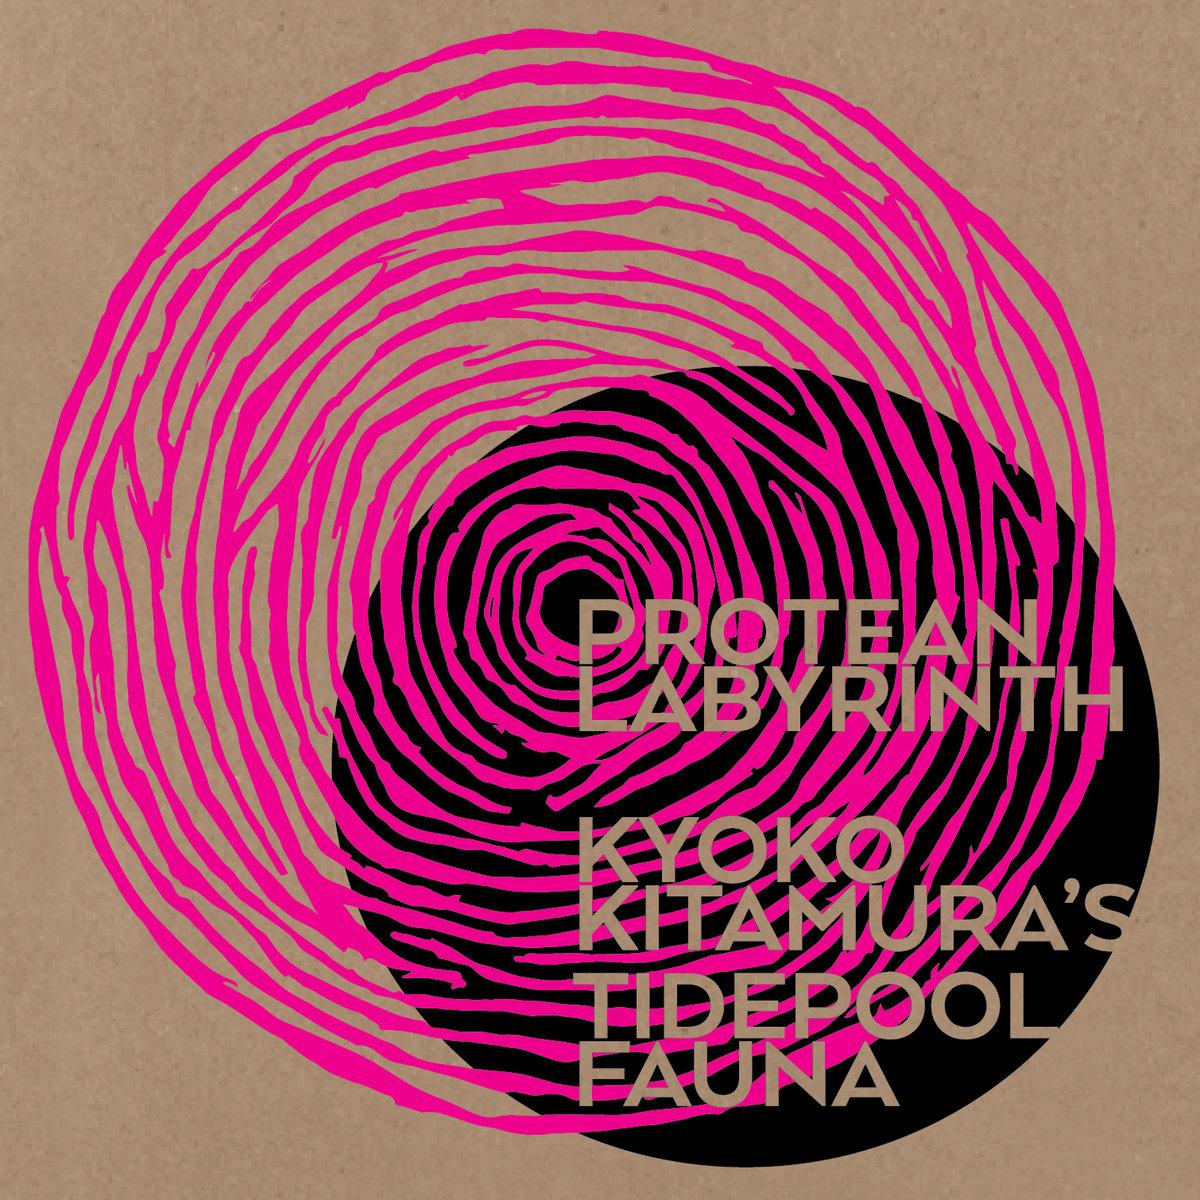 Review: Kyoko Kitamura's Tidepool Fauna – Protean Labyrinth